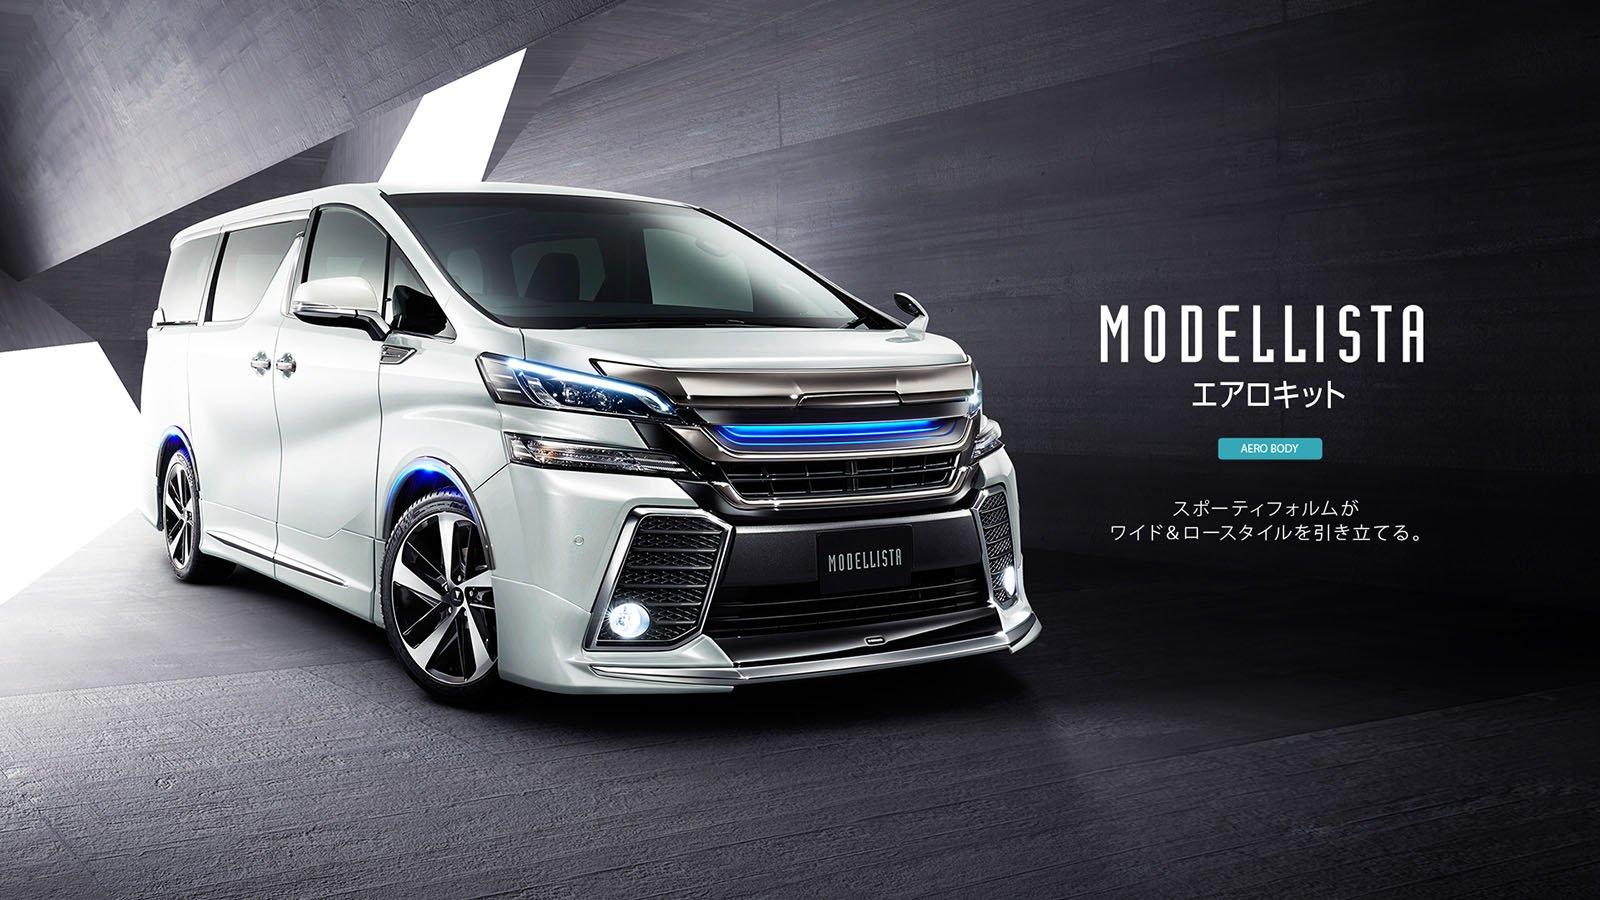 2016 Toyota Alphard Vellfire Get Modellista Body Kits